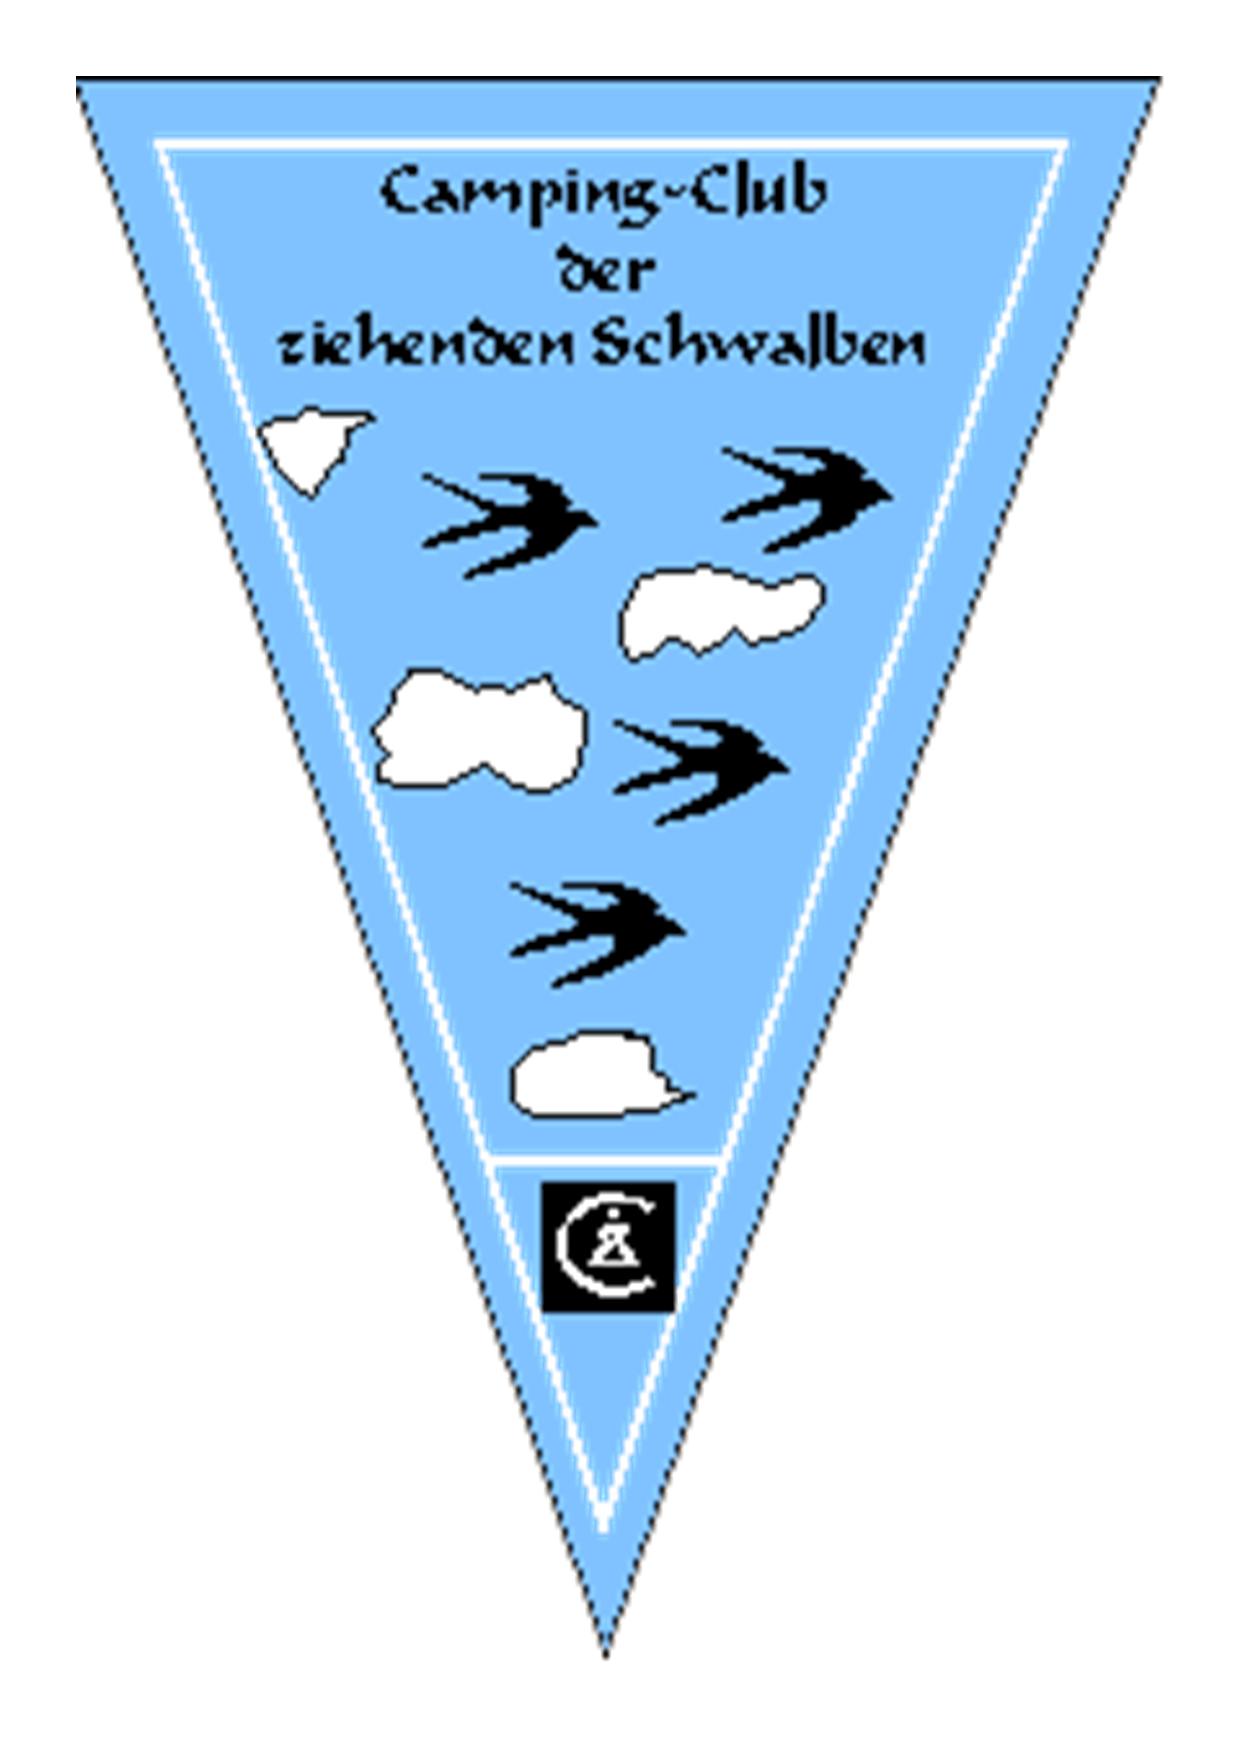 dcc-lv-weser-ems-schwalben